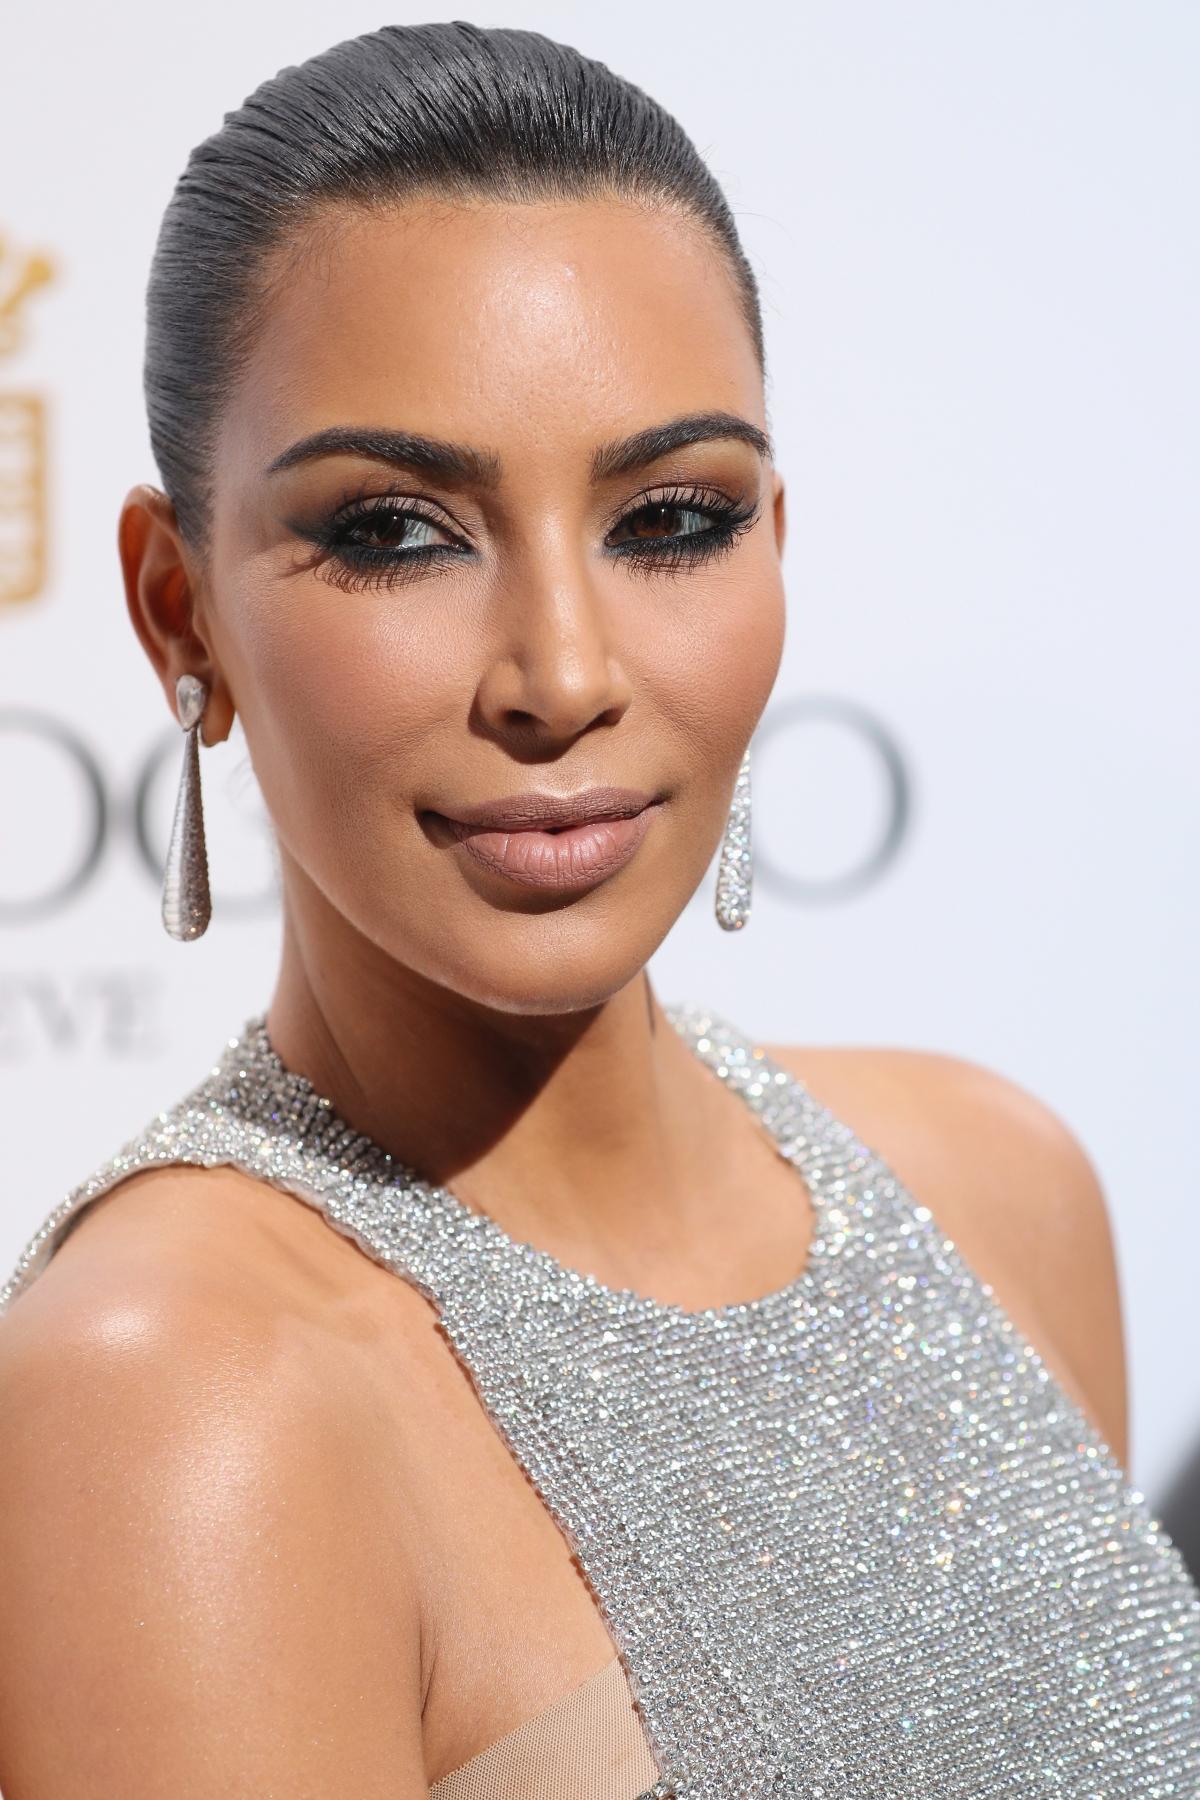 Cannes Film Festival 2016: Kim Kardashian sparkles in ... Kim Kardashian